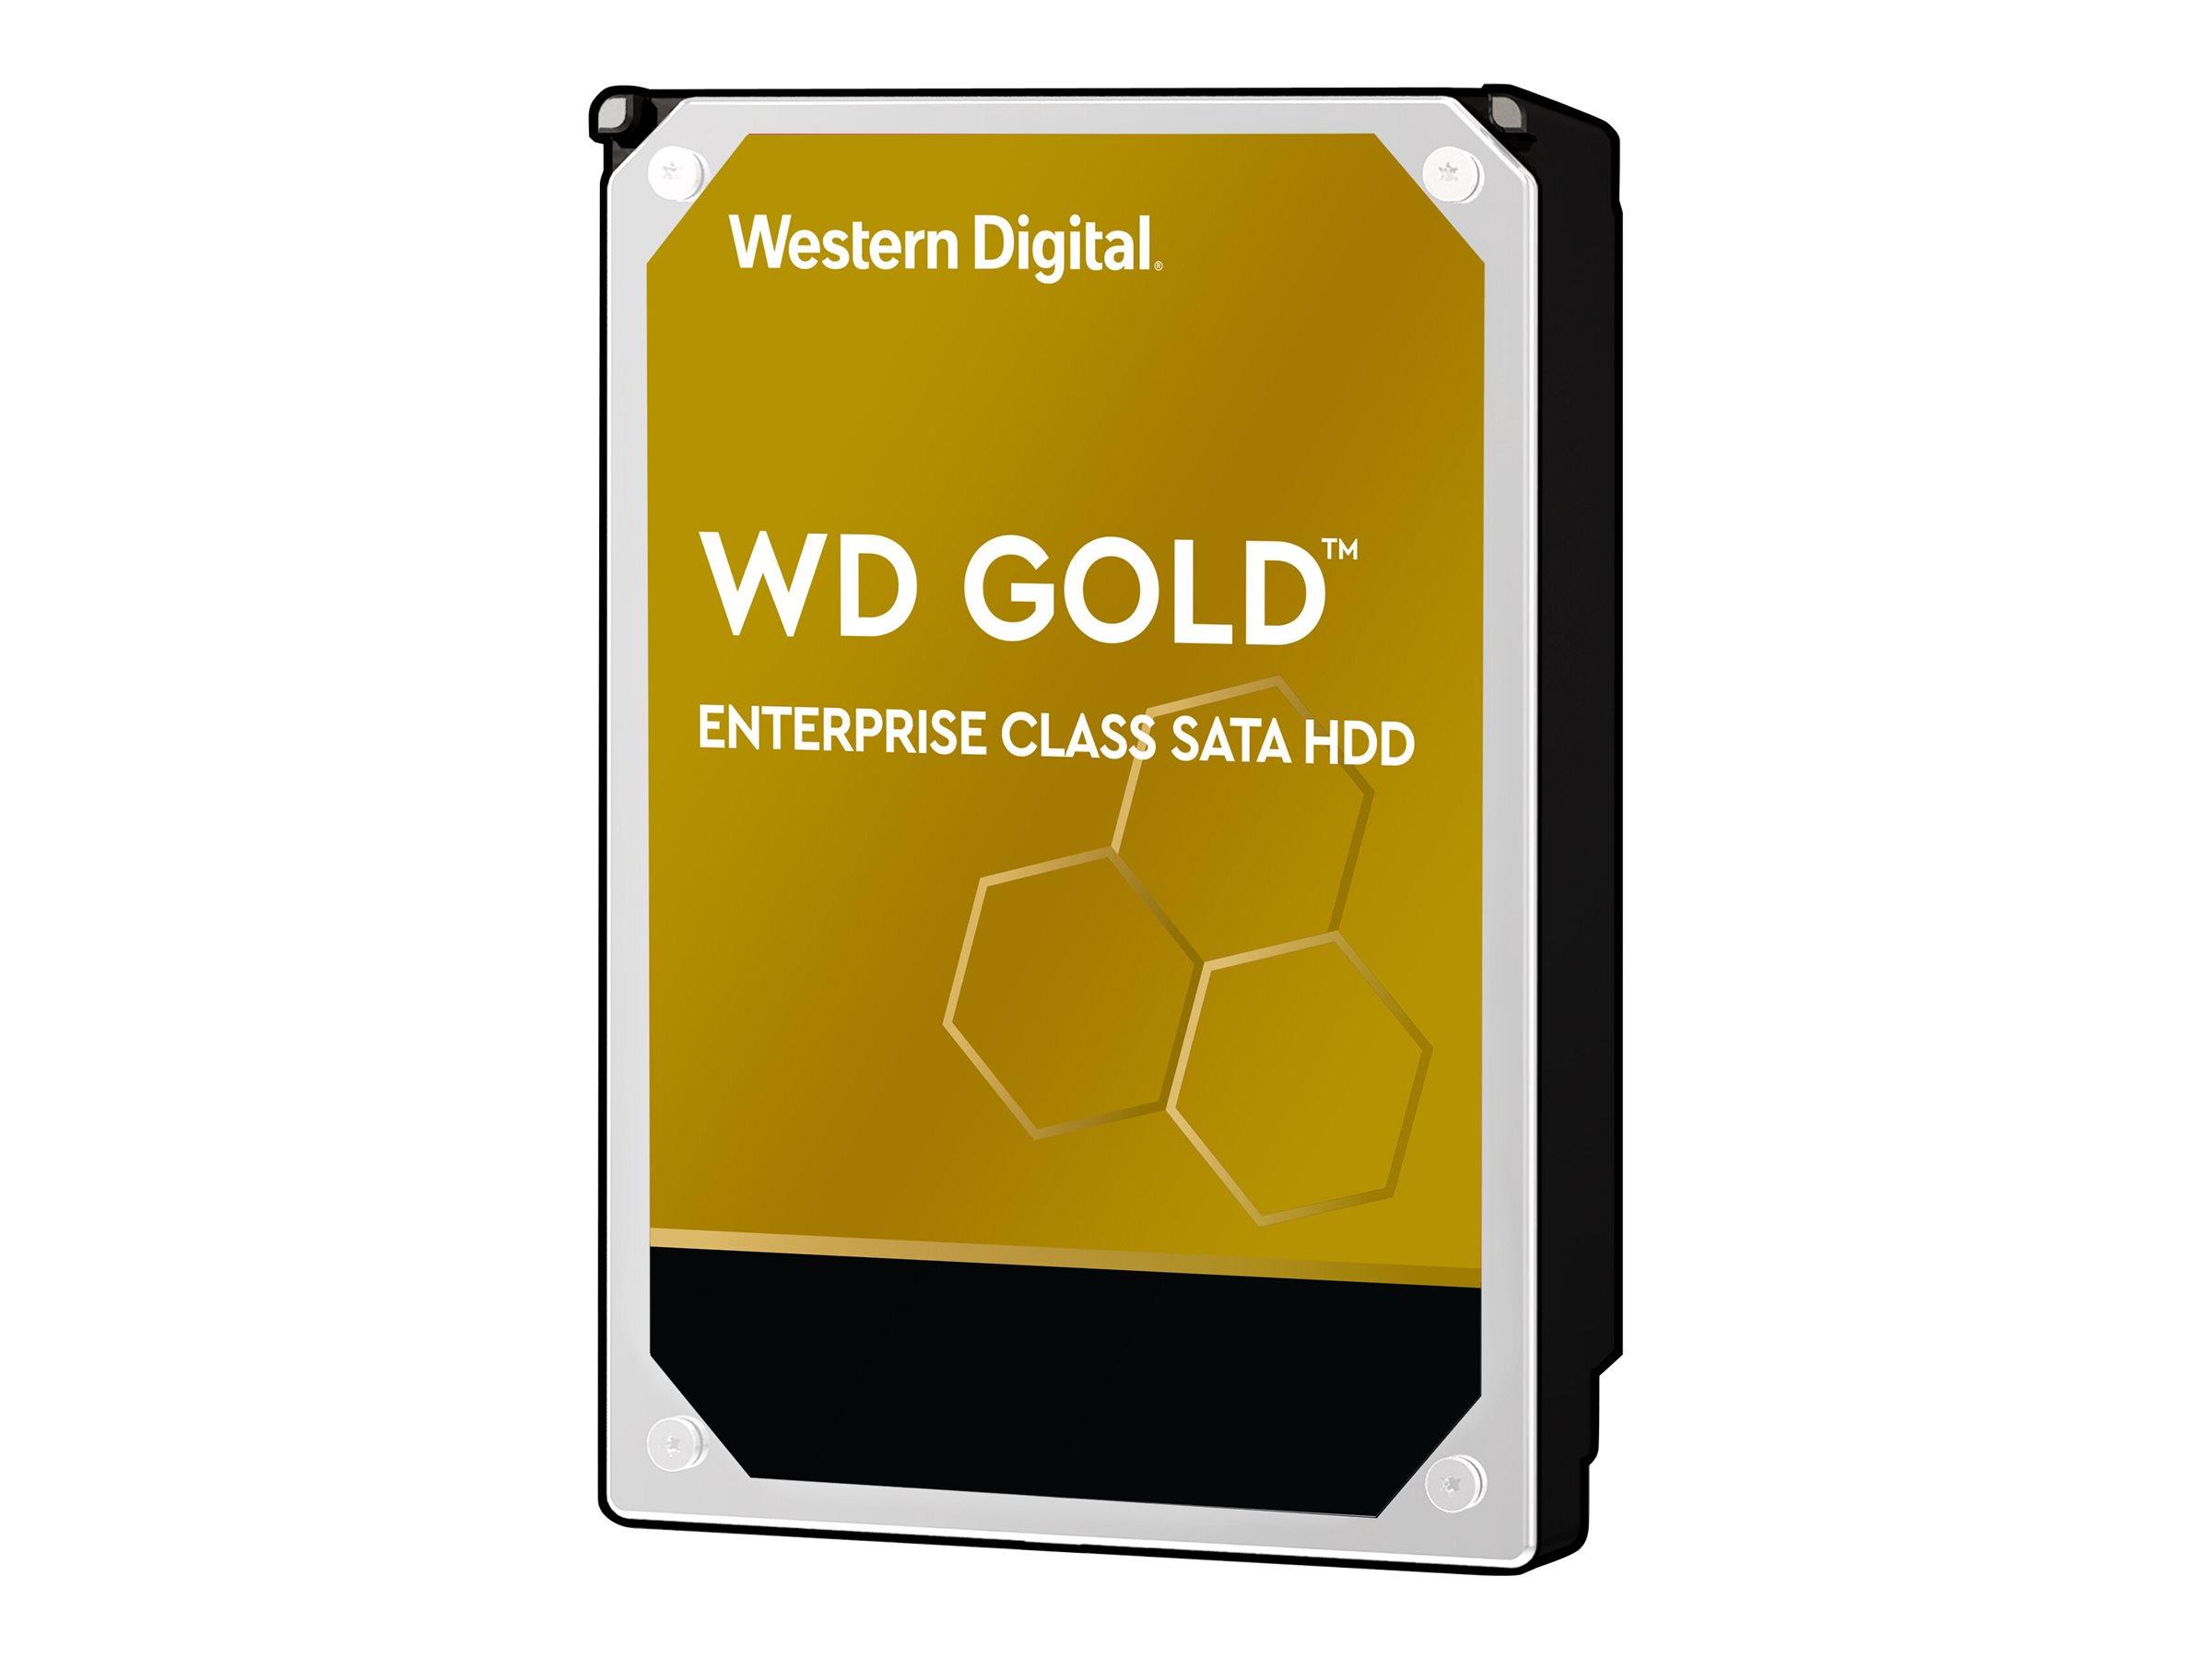 WD Gold DC HA750 Enterprise Class SATA HDD WD141KRYZ - Festplatte - 14 TB - intern - 3.5